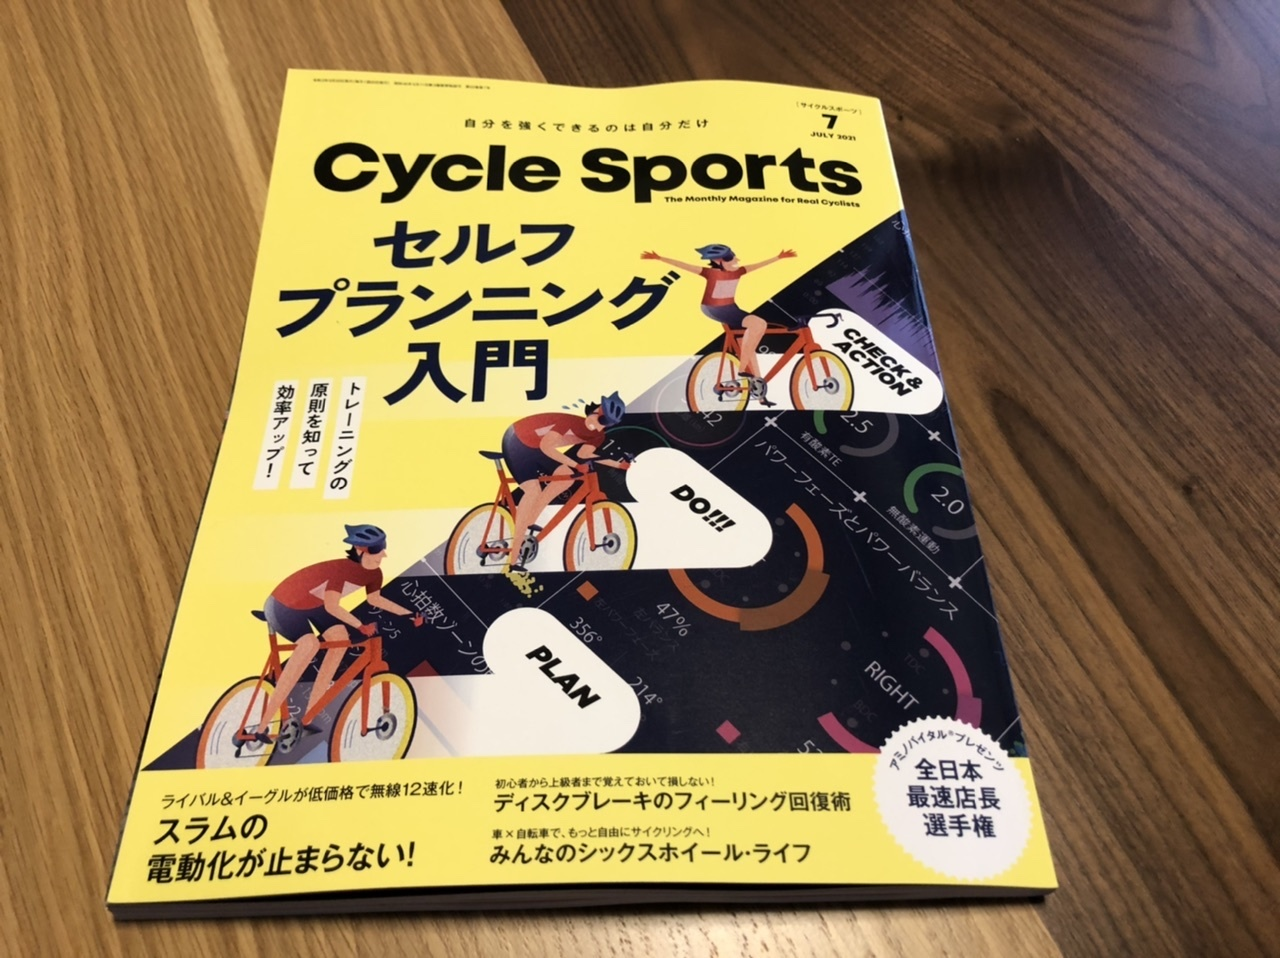 CycleSports7月号発売中~!!全日本最速店長選手権載ってます!_e0365437_10542620.jpeg